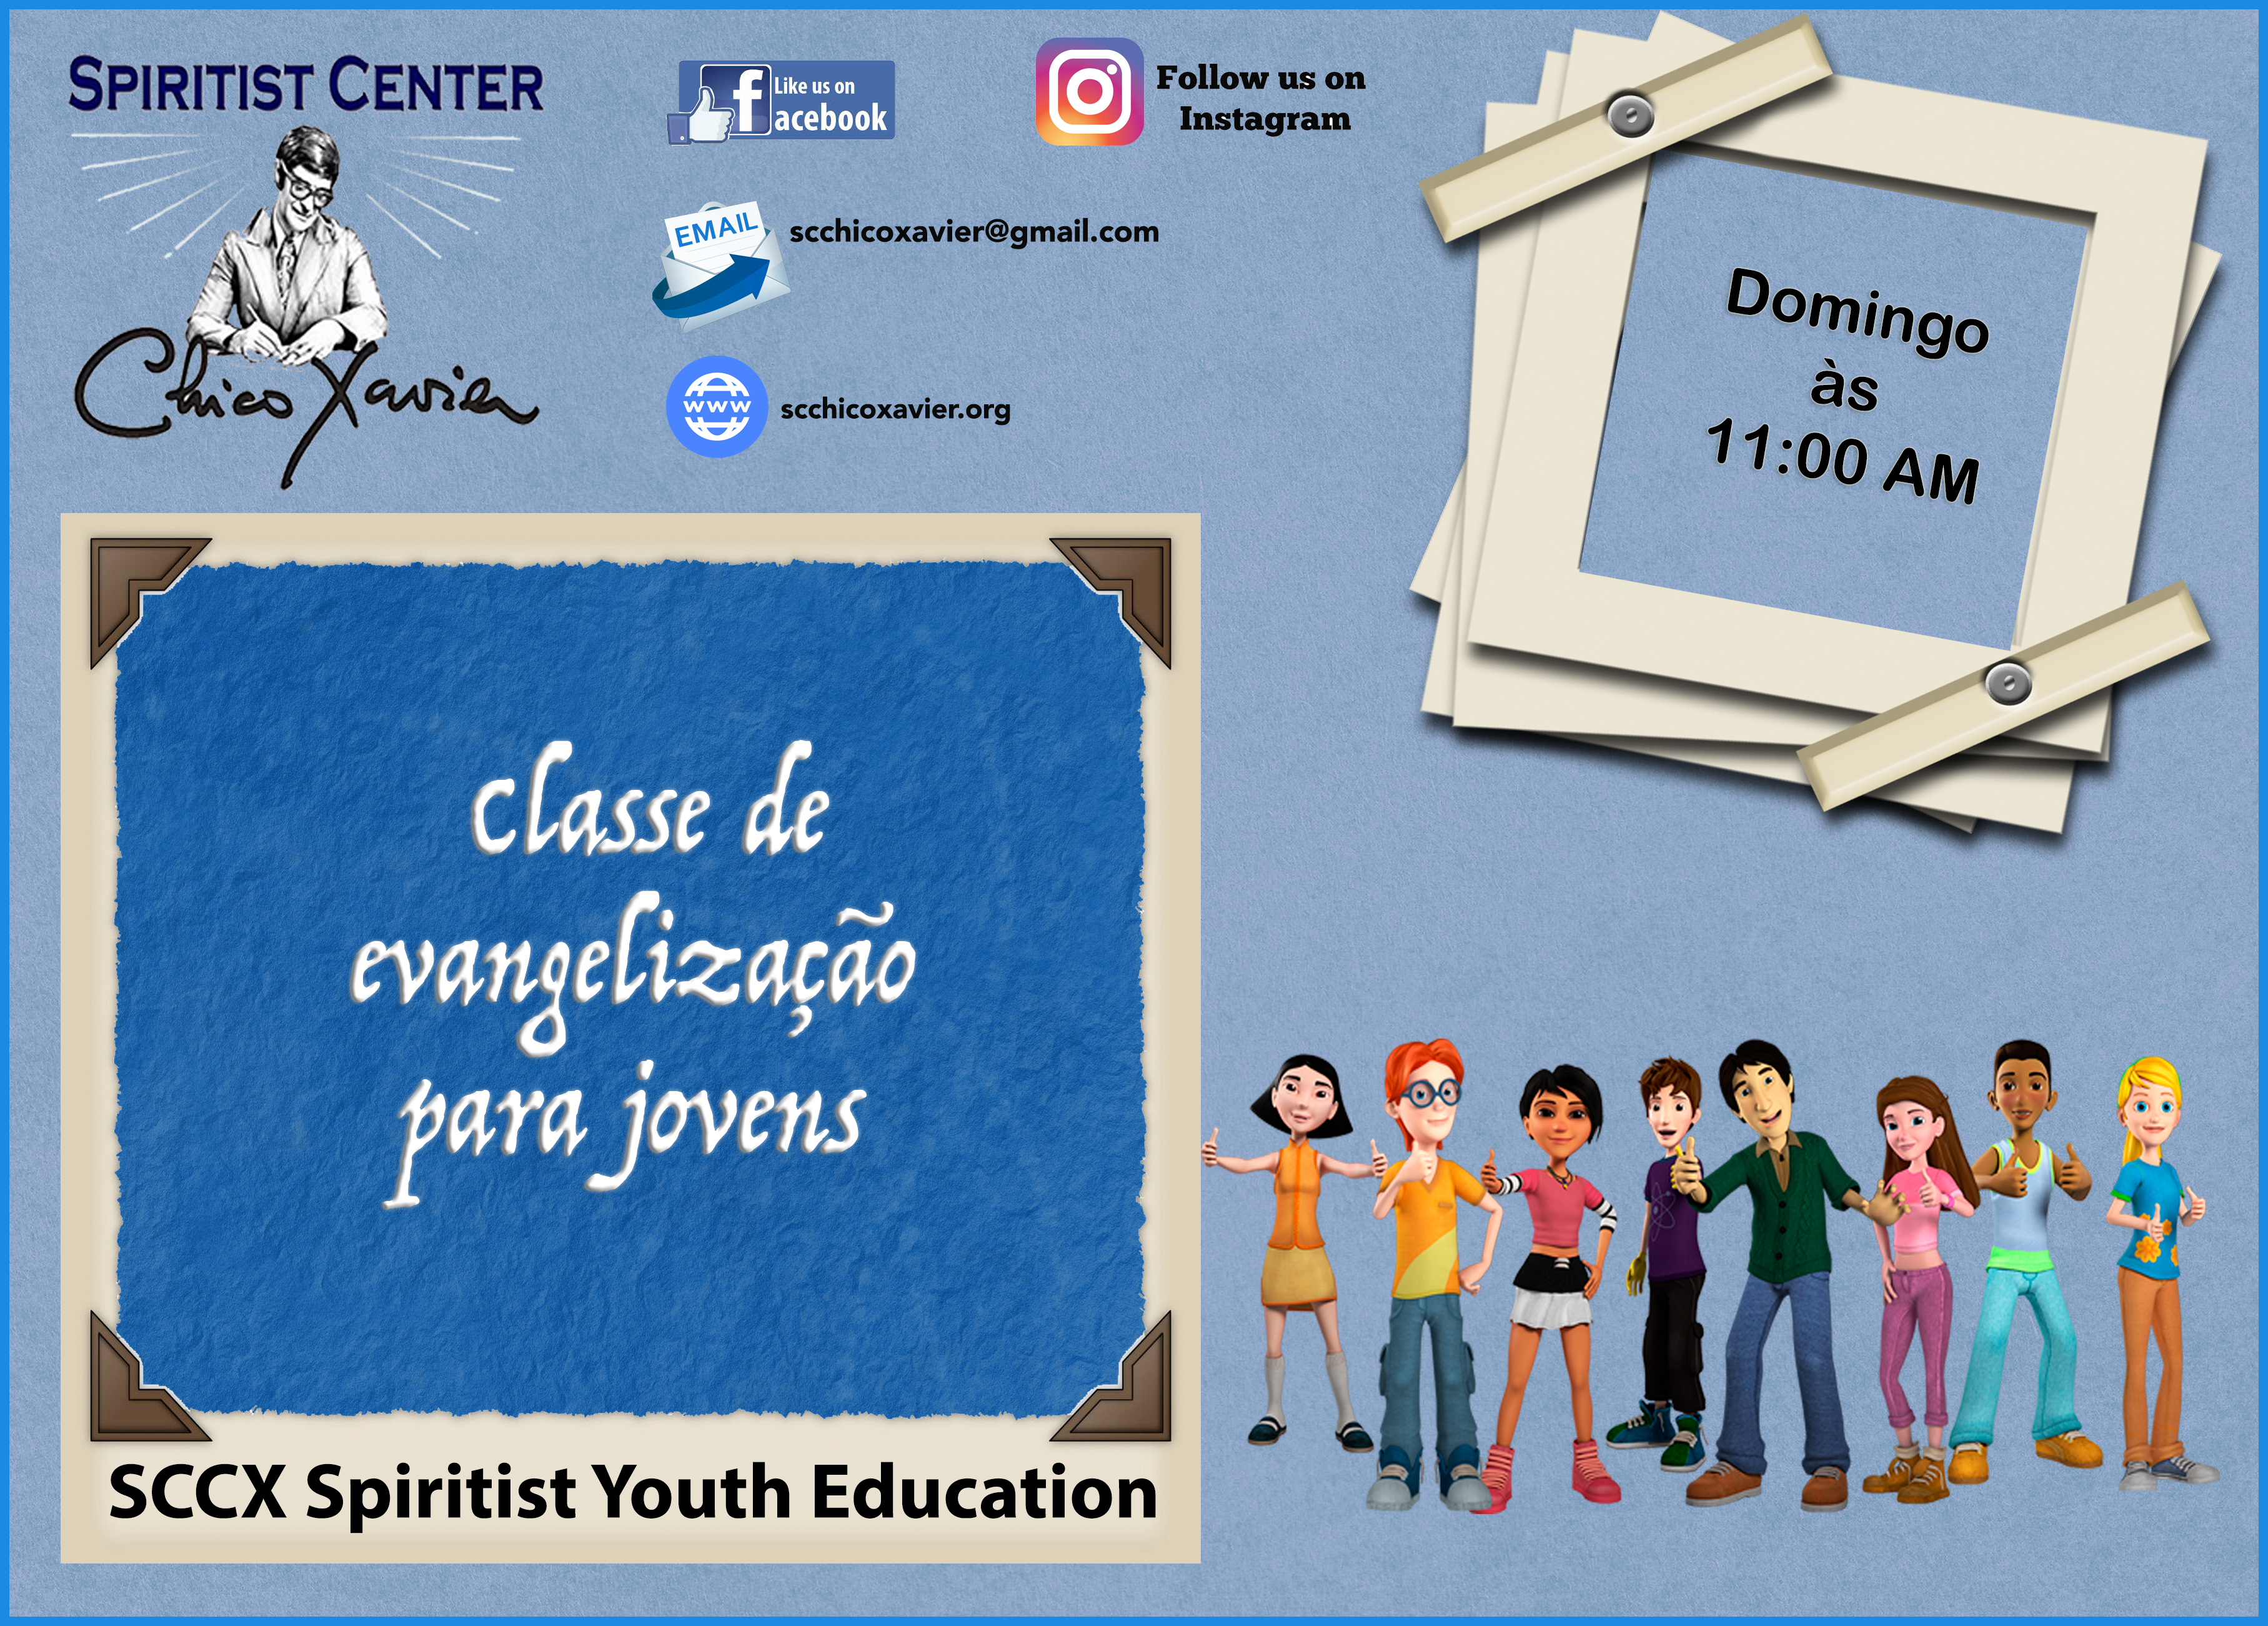 SCCX Yoth Education